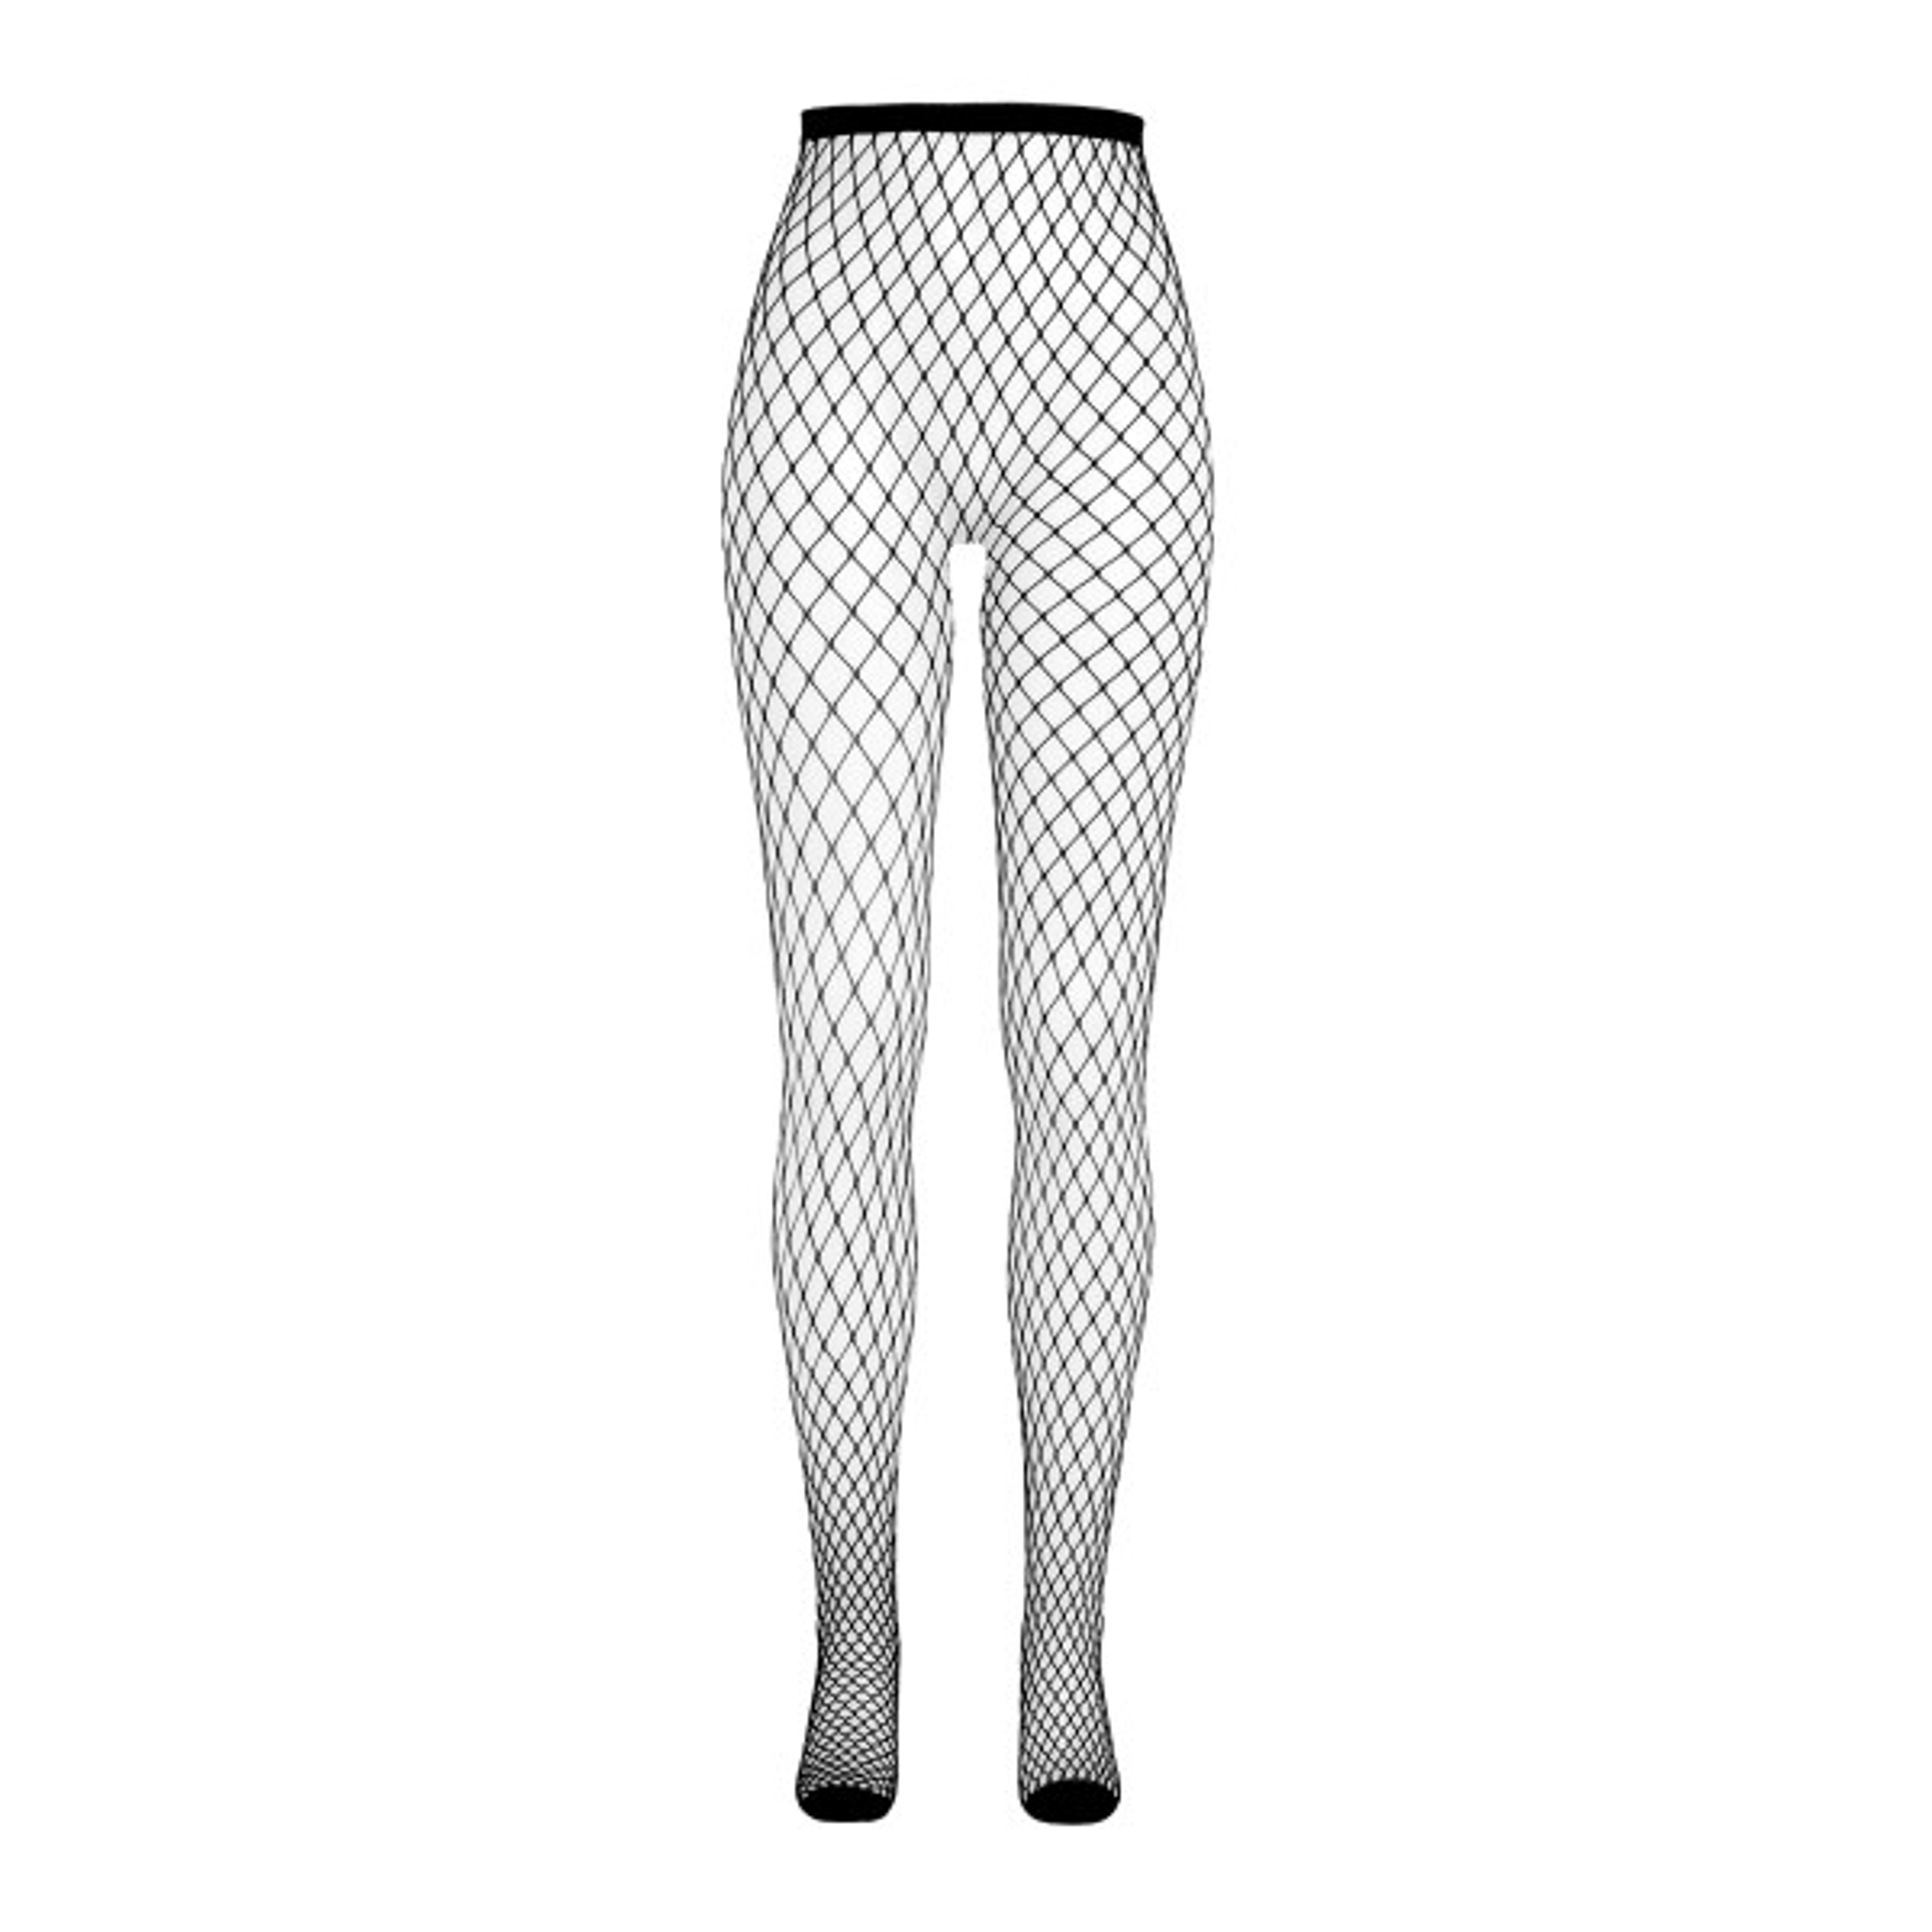 جوراب شلواری زنانه سانپل جیرنو کد RG-SC 100